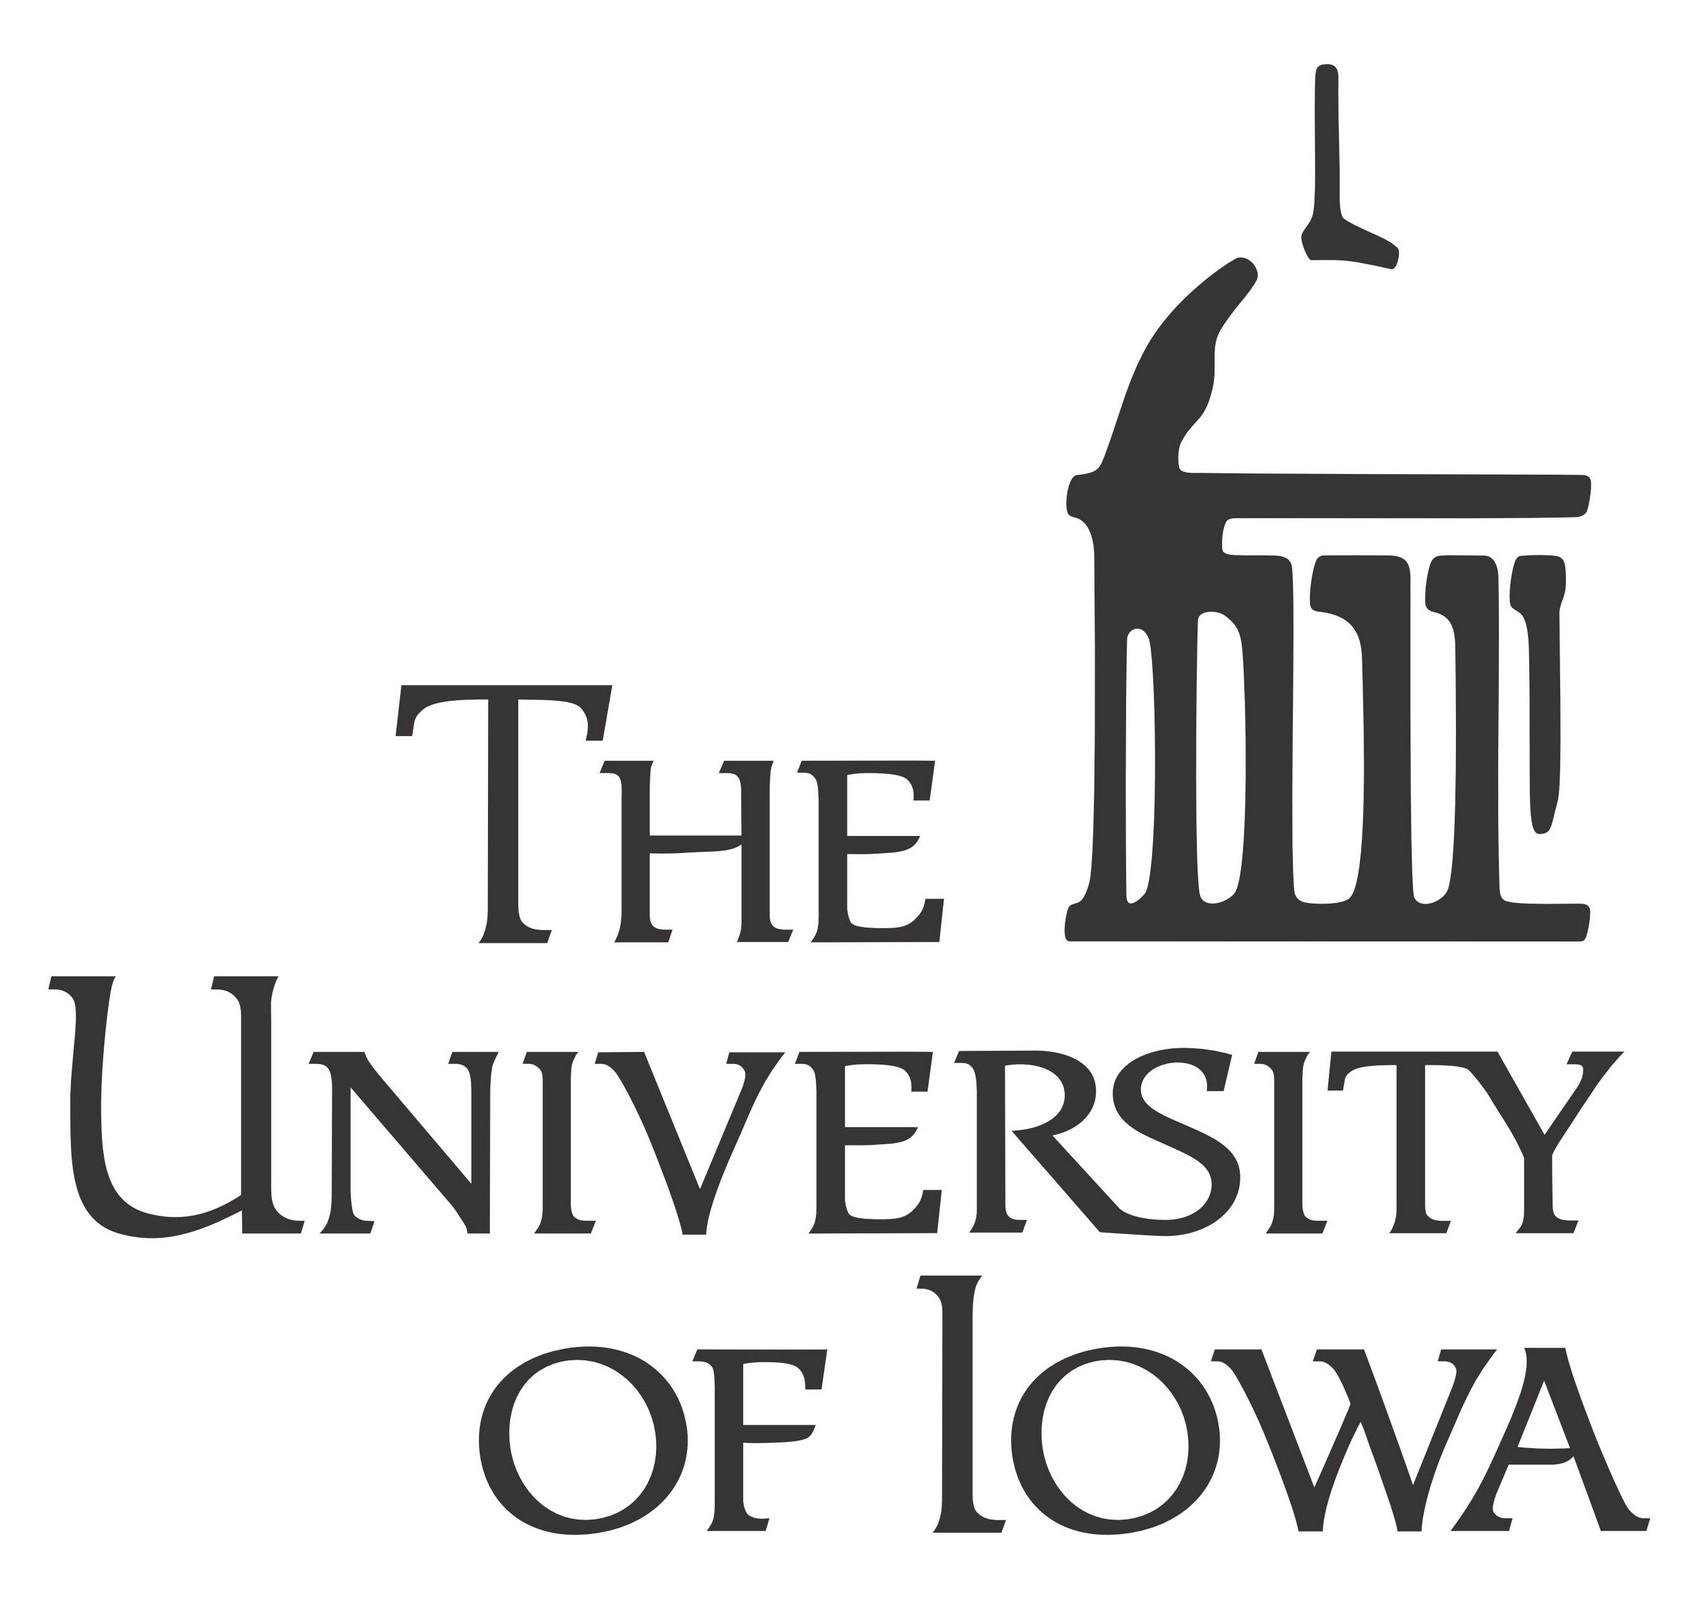 University of Iowa Bachelor's in Data Science